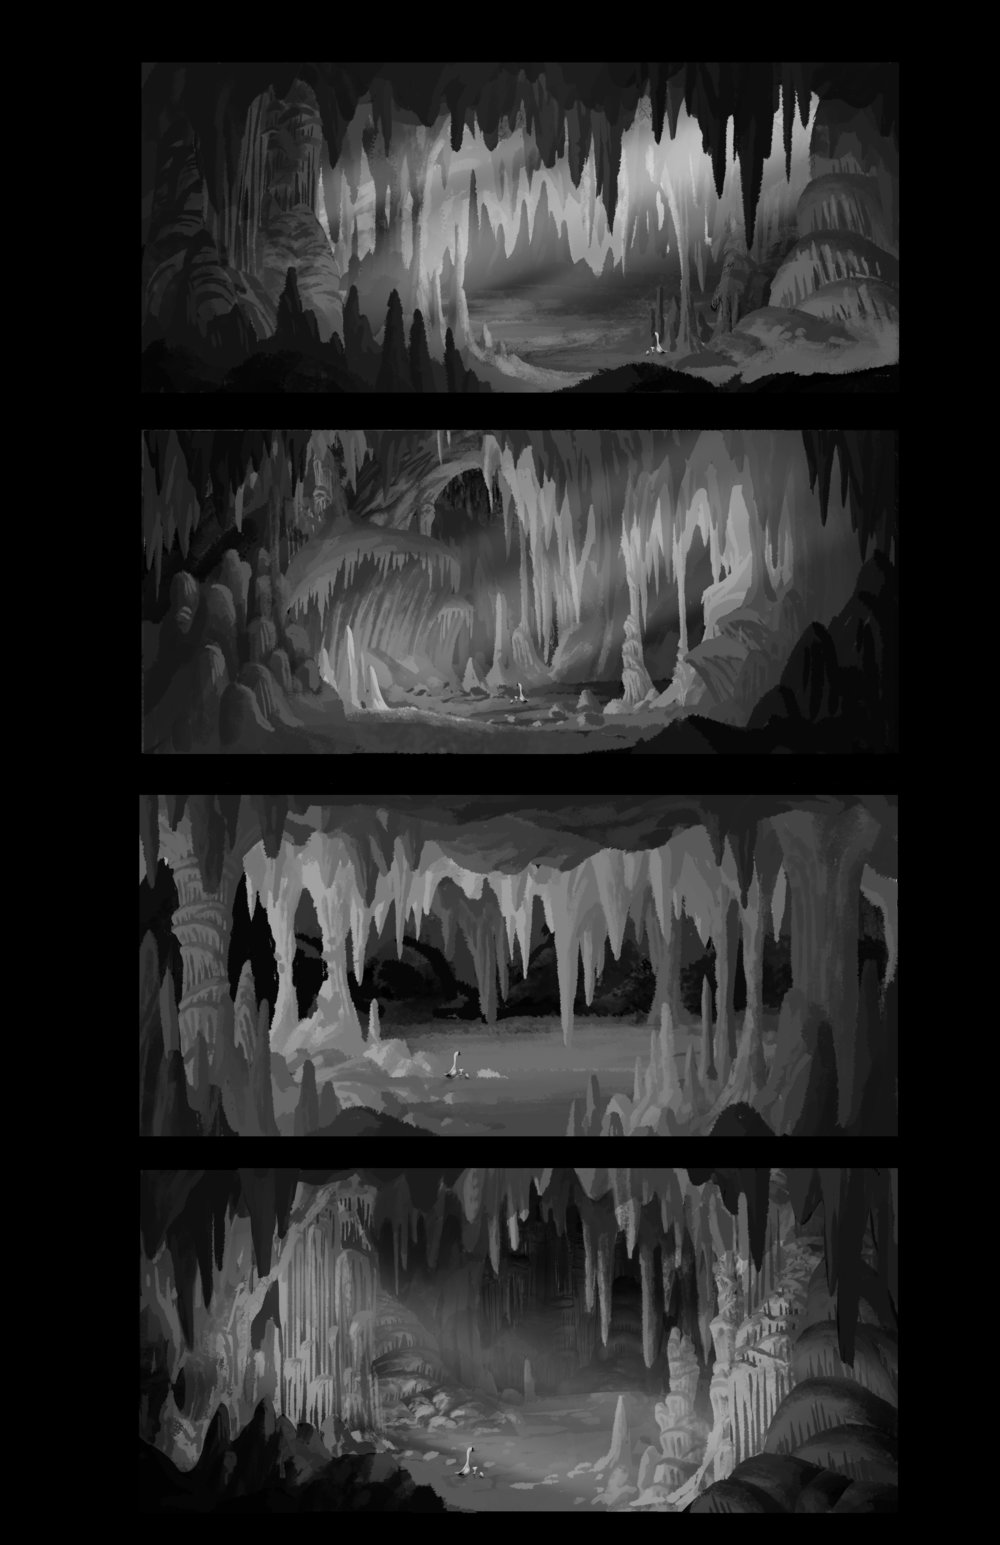 cave_thumbnail2.jpg